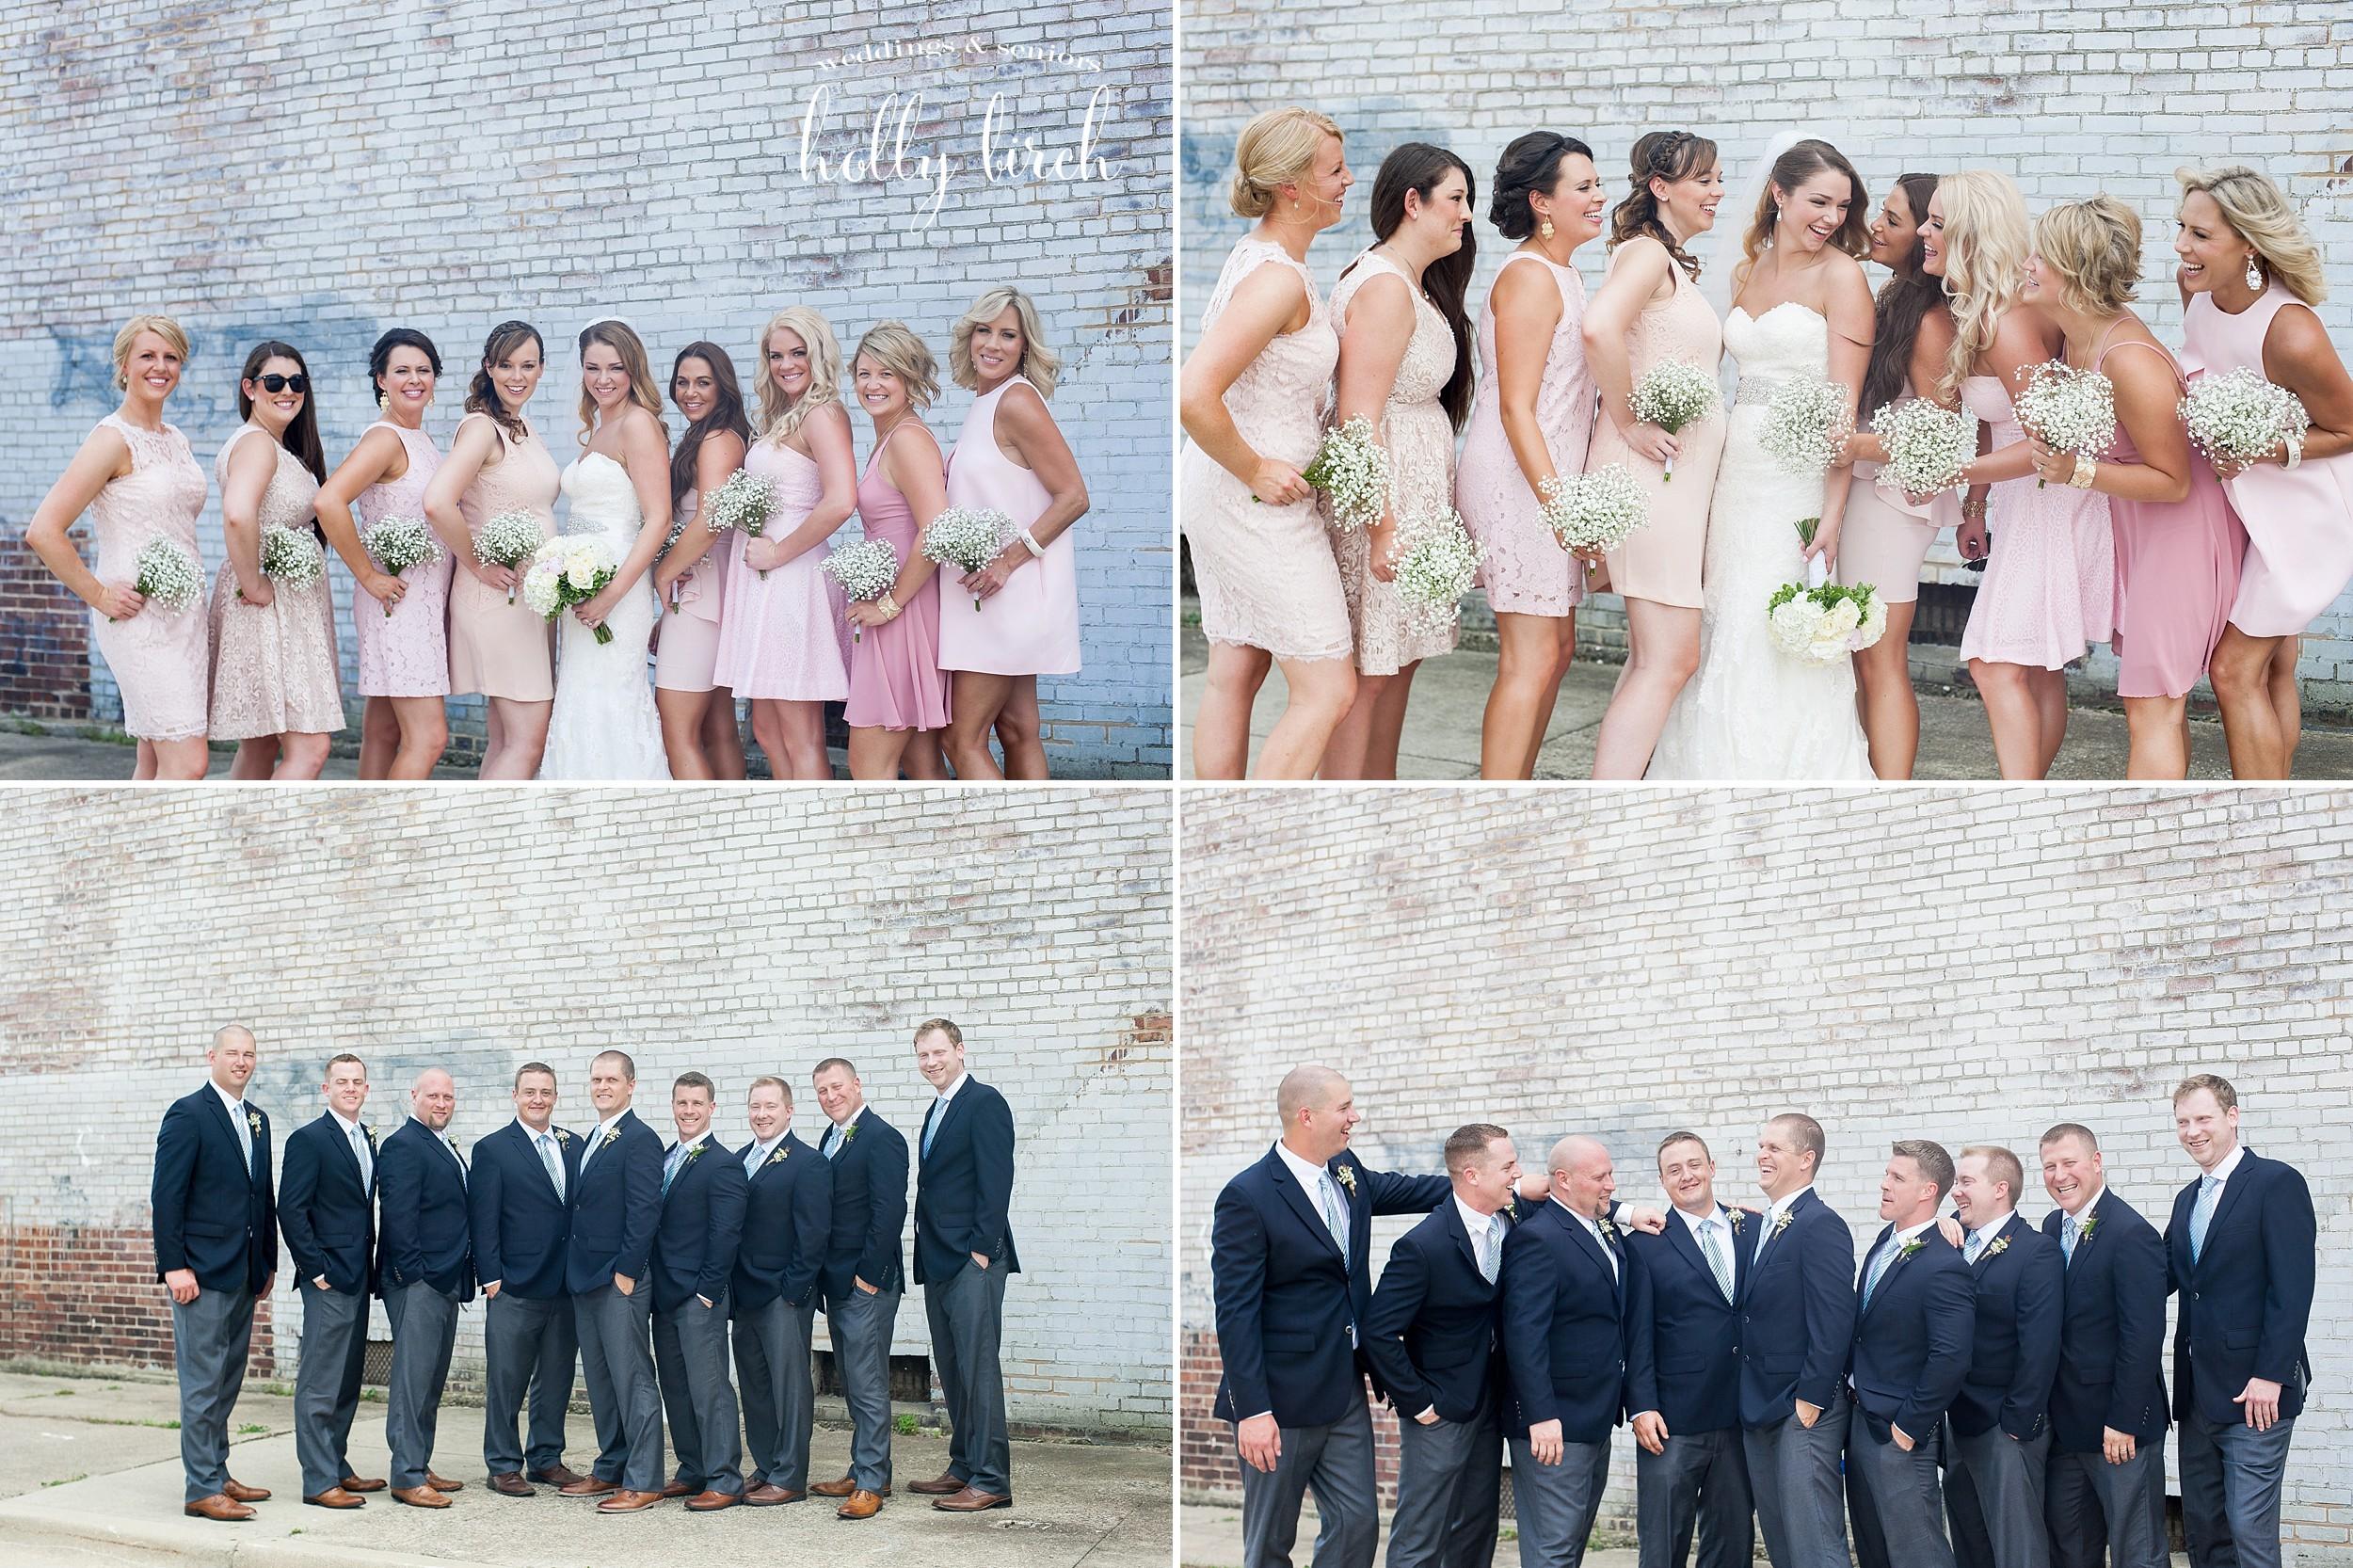 blush bridesmaids and groomsmen